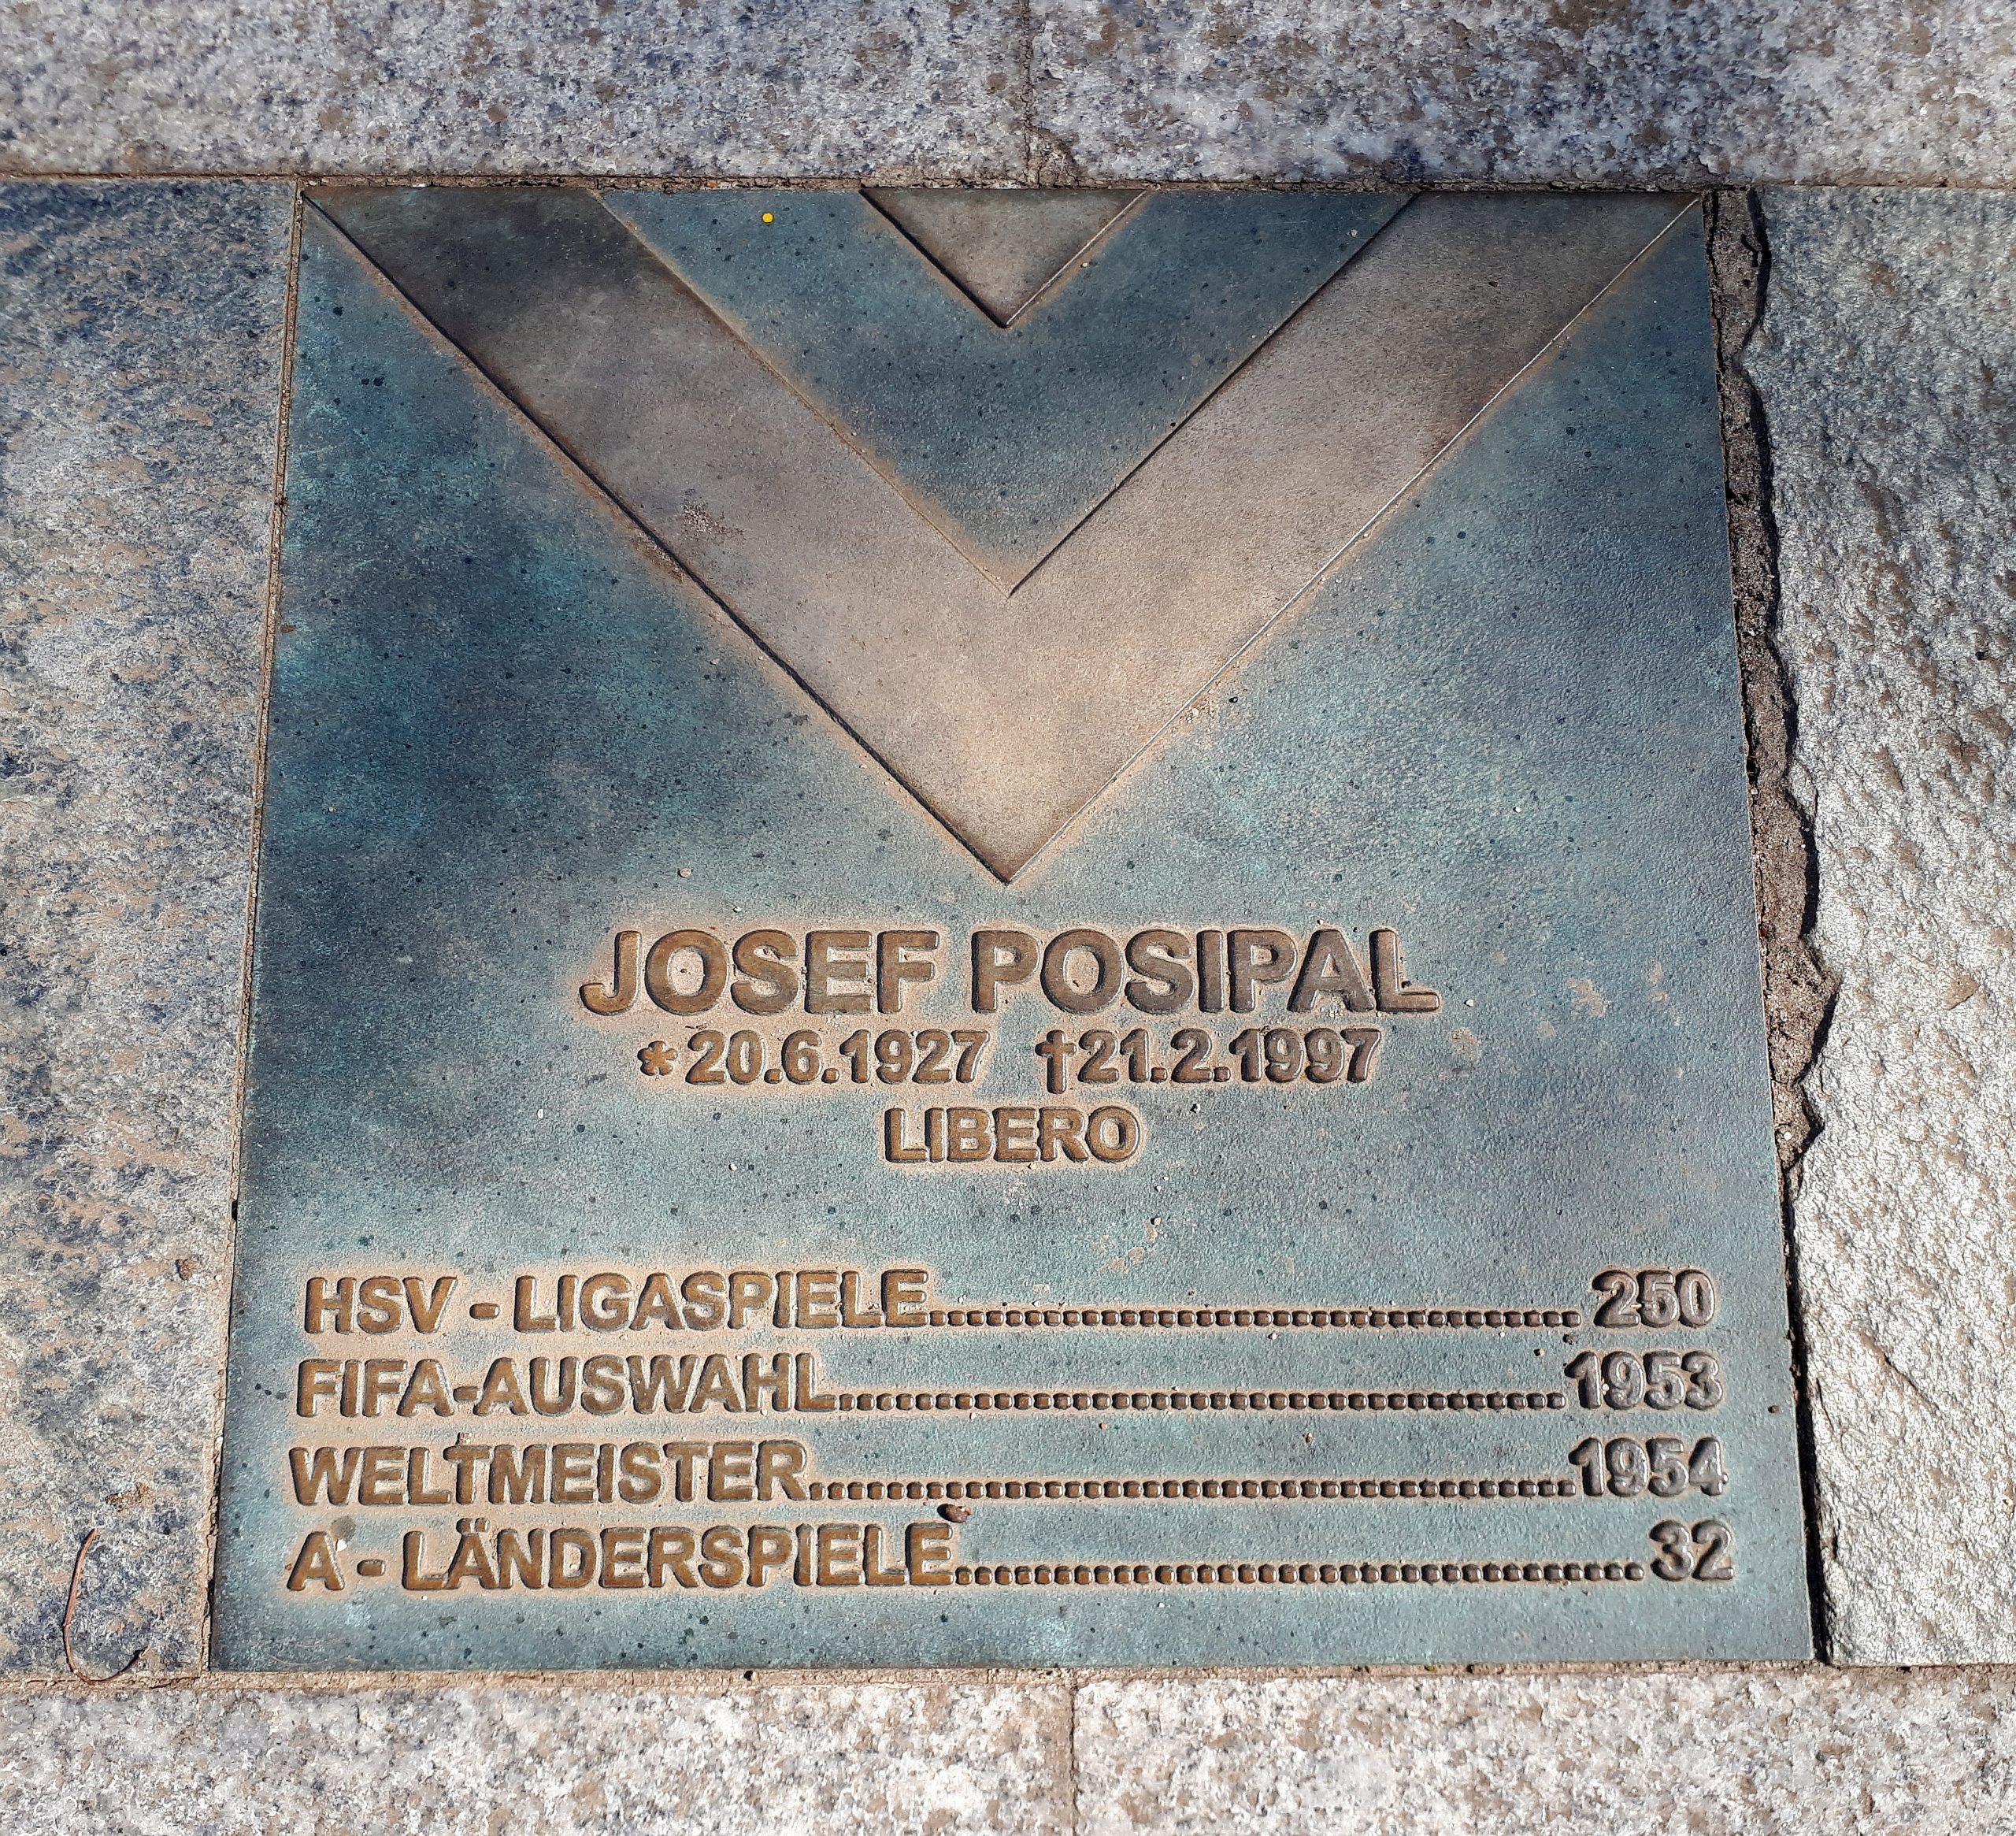 Der Walk of Fame: Jupp Posipal